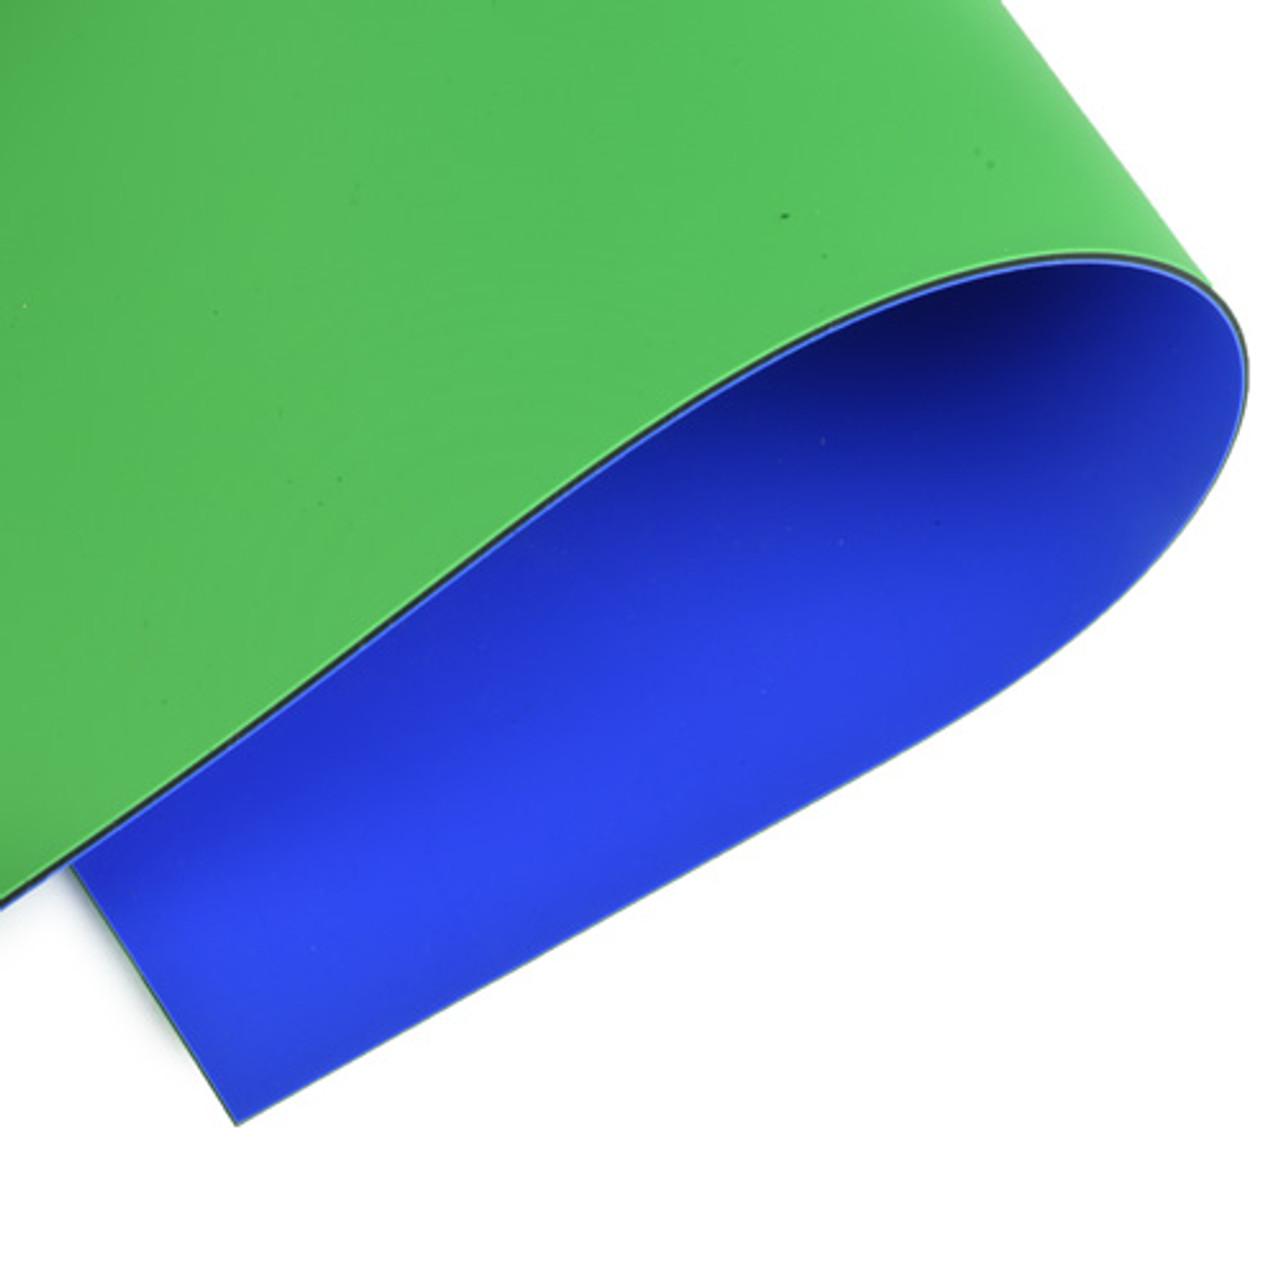 Rosco Chroma Floor (Chroma Key), Green Screen